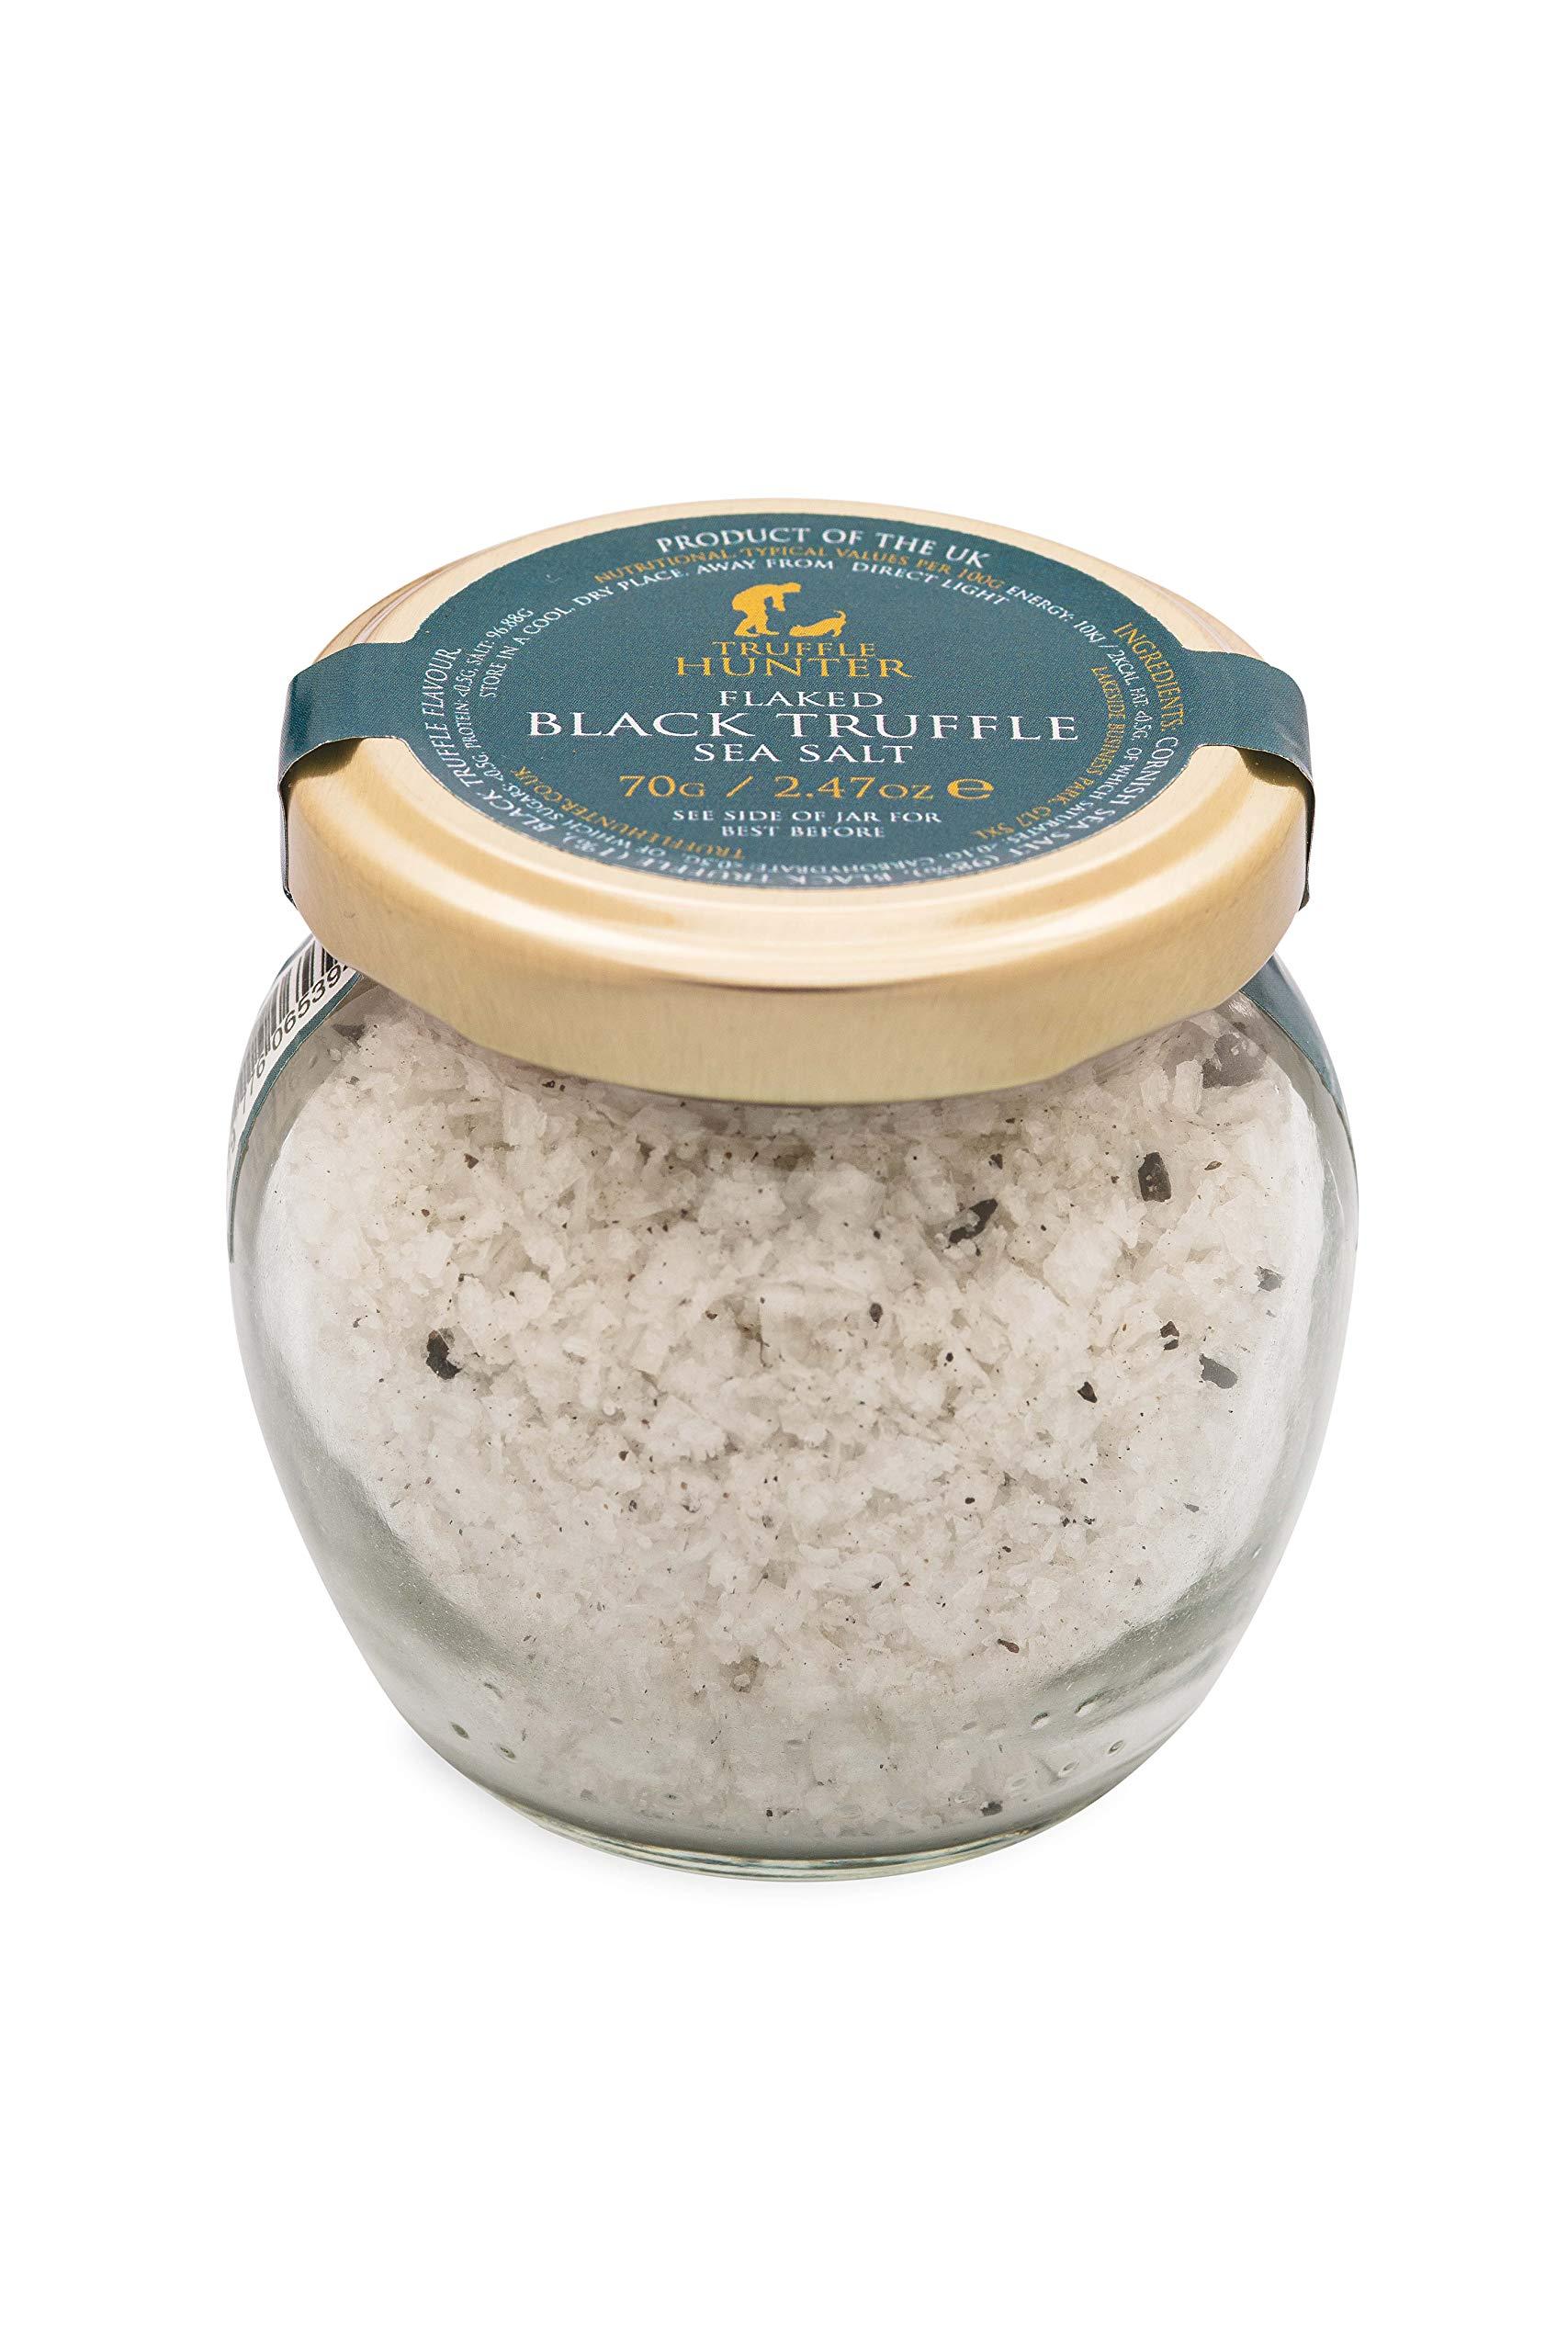 TruffleHunter Real Flaked Black Truffle Cornish Sea Salt (70g) - European Black Summer Truffles (Tuber Aestivum) - Gourmet Food Seasoning Cooking Condiments - Gluten Free, Vegan, Vegetarian